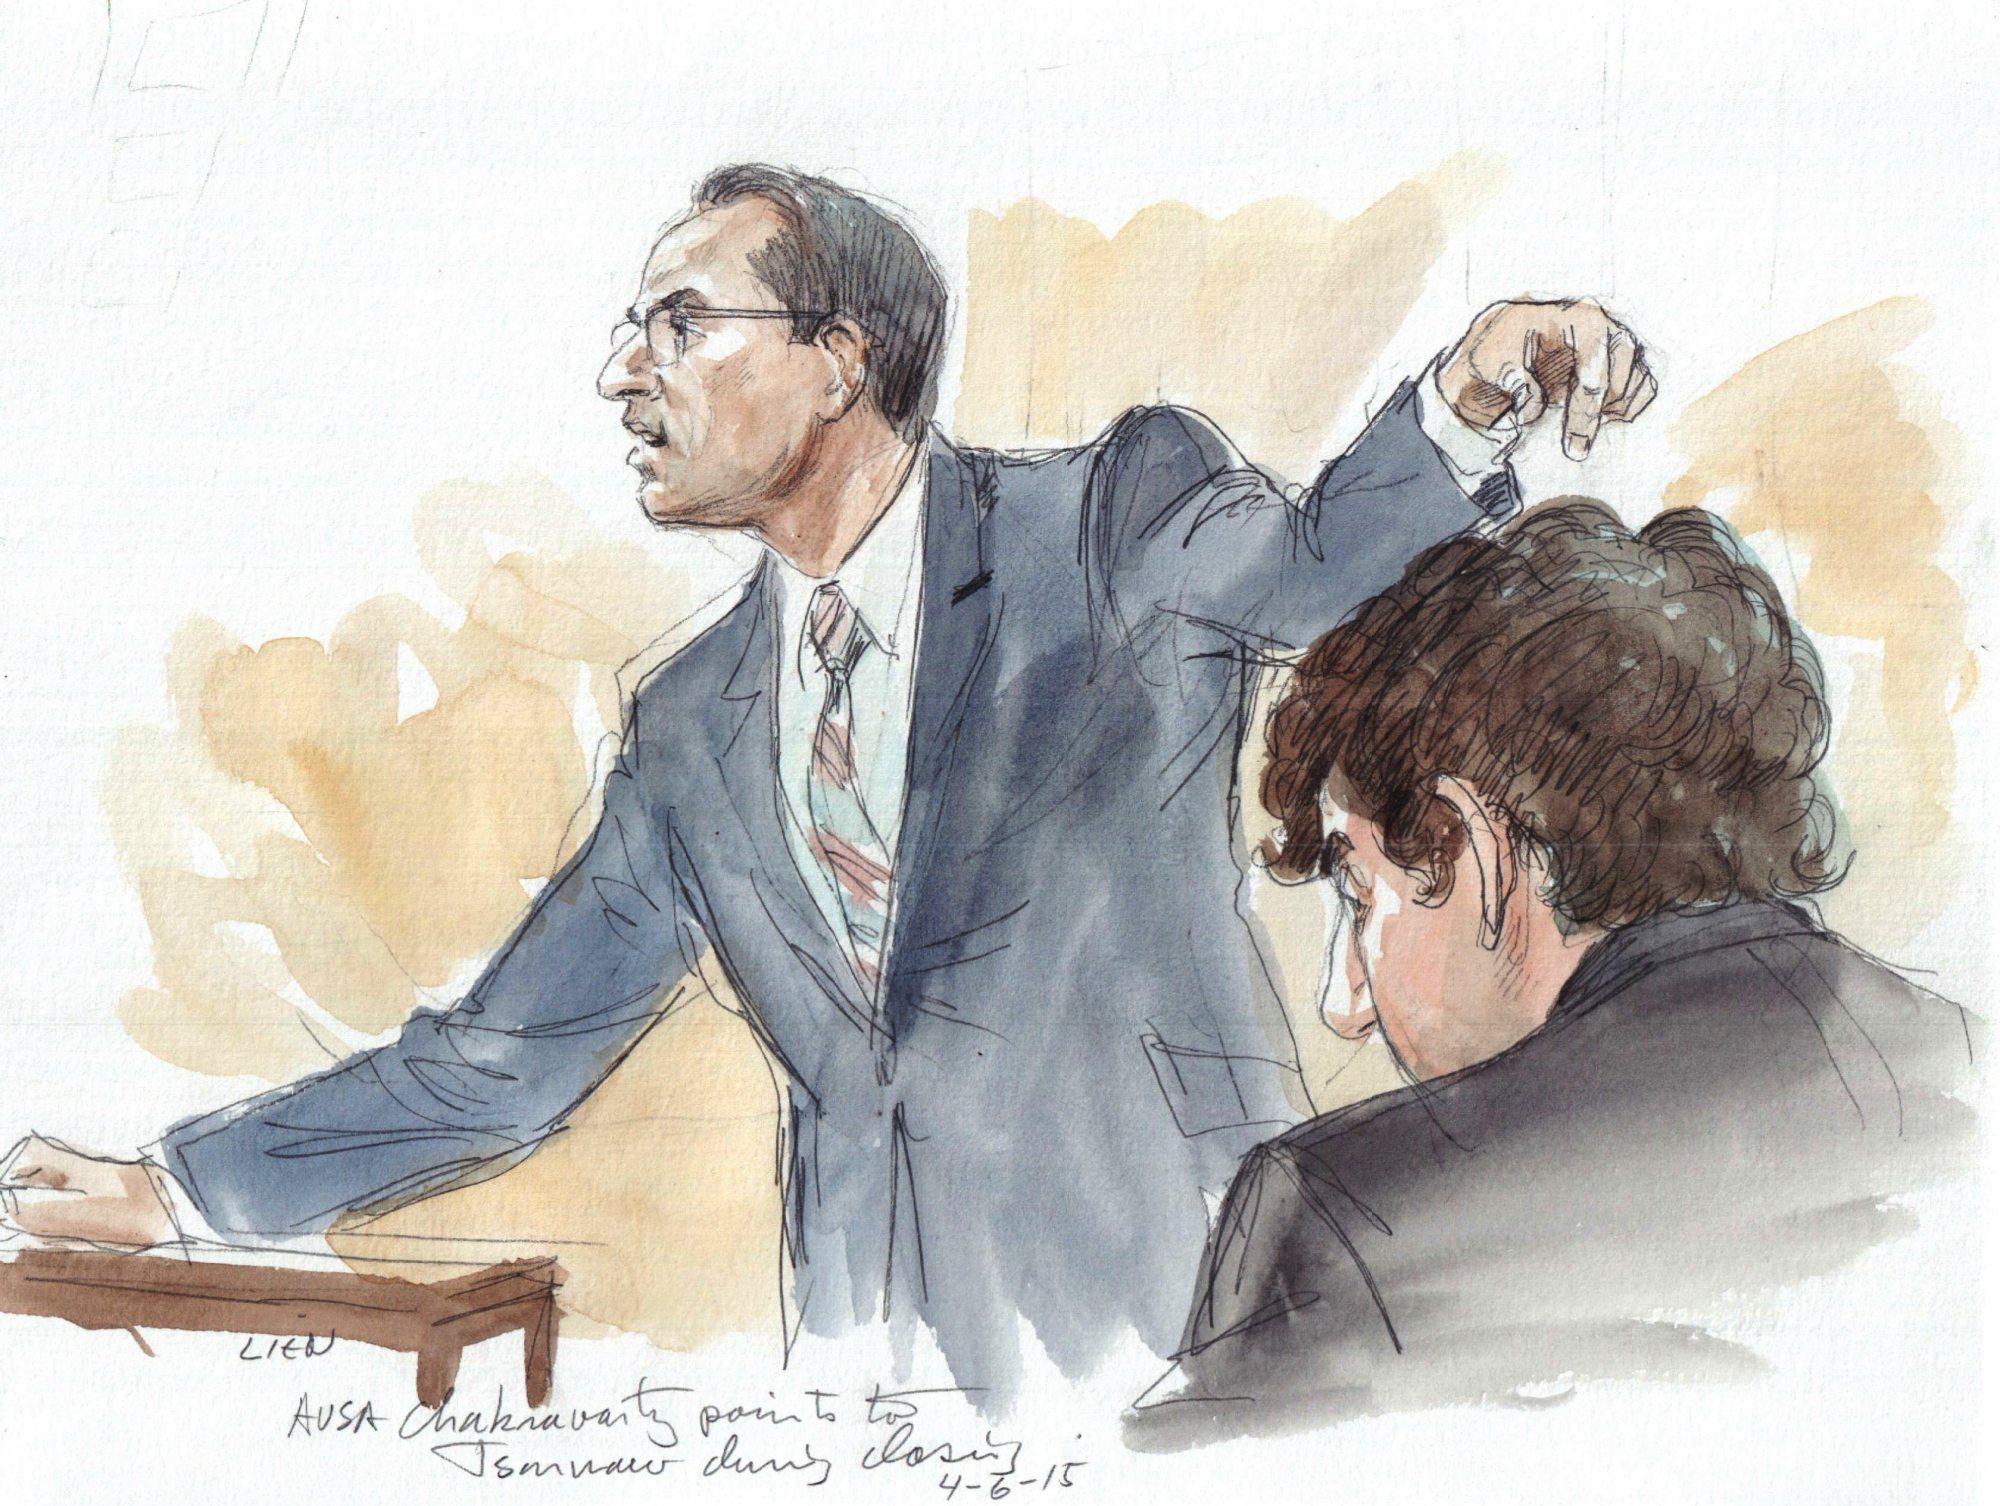 Tsarnaev-guilty-of-all-30-counts-in-Boston-bombing